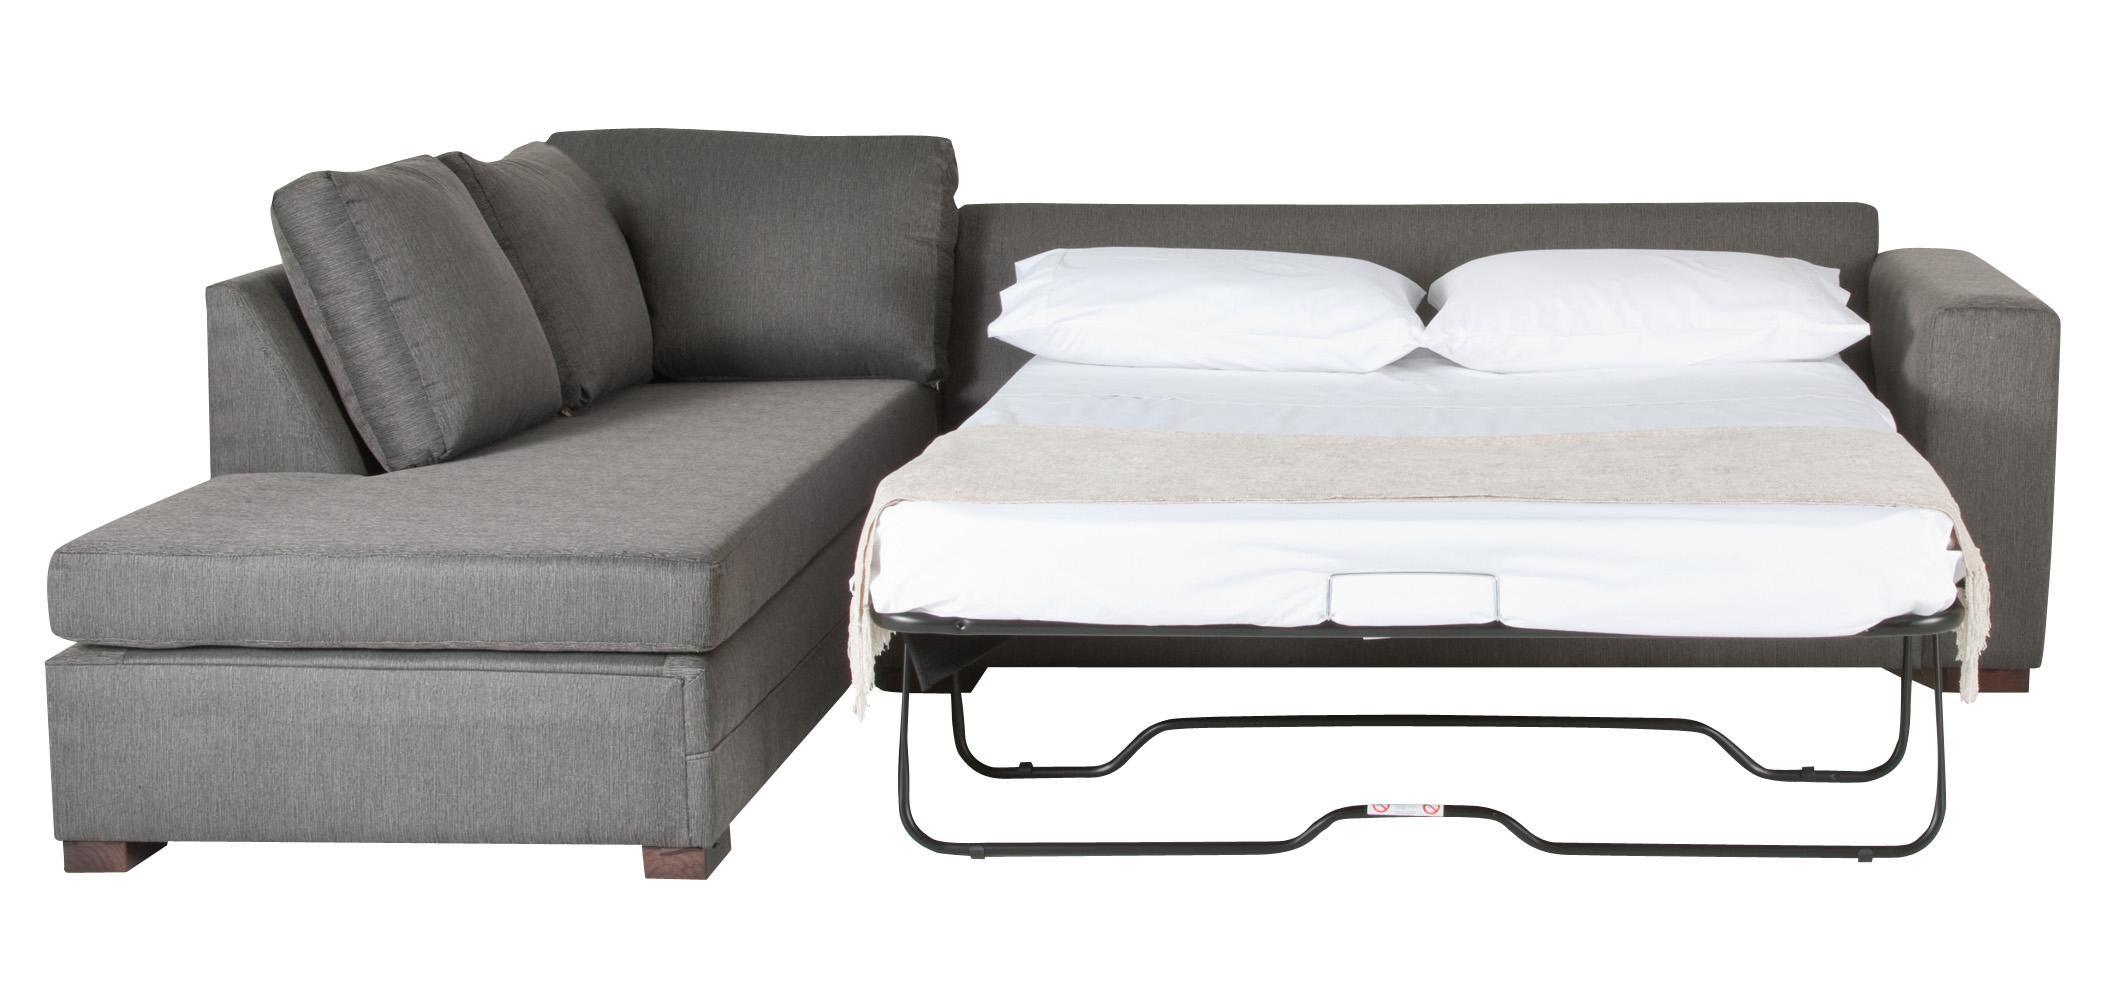 Sectional Sleeper Sofa Ikea – Interior Design Pertaining To Sleeper Sofas Ikea (Image 10 of 20)